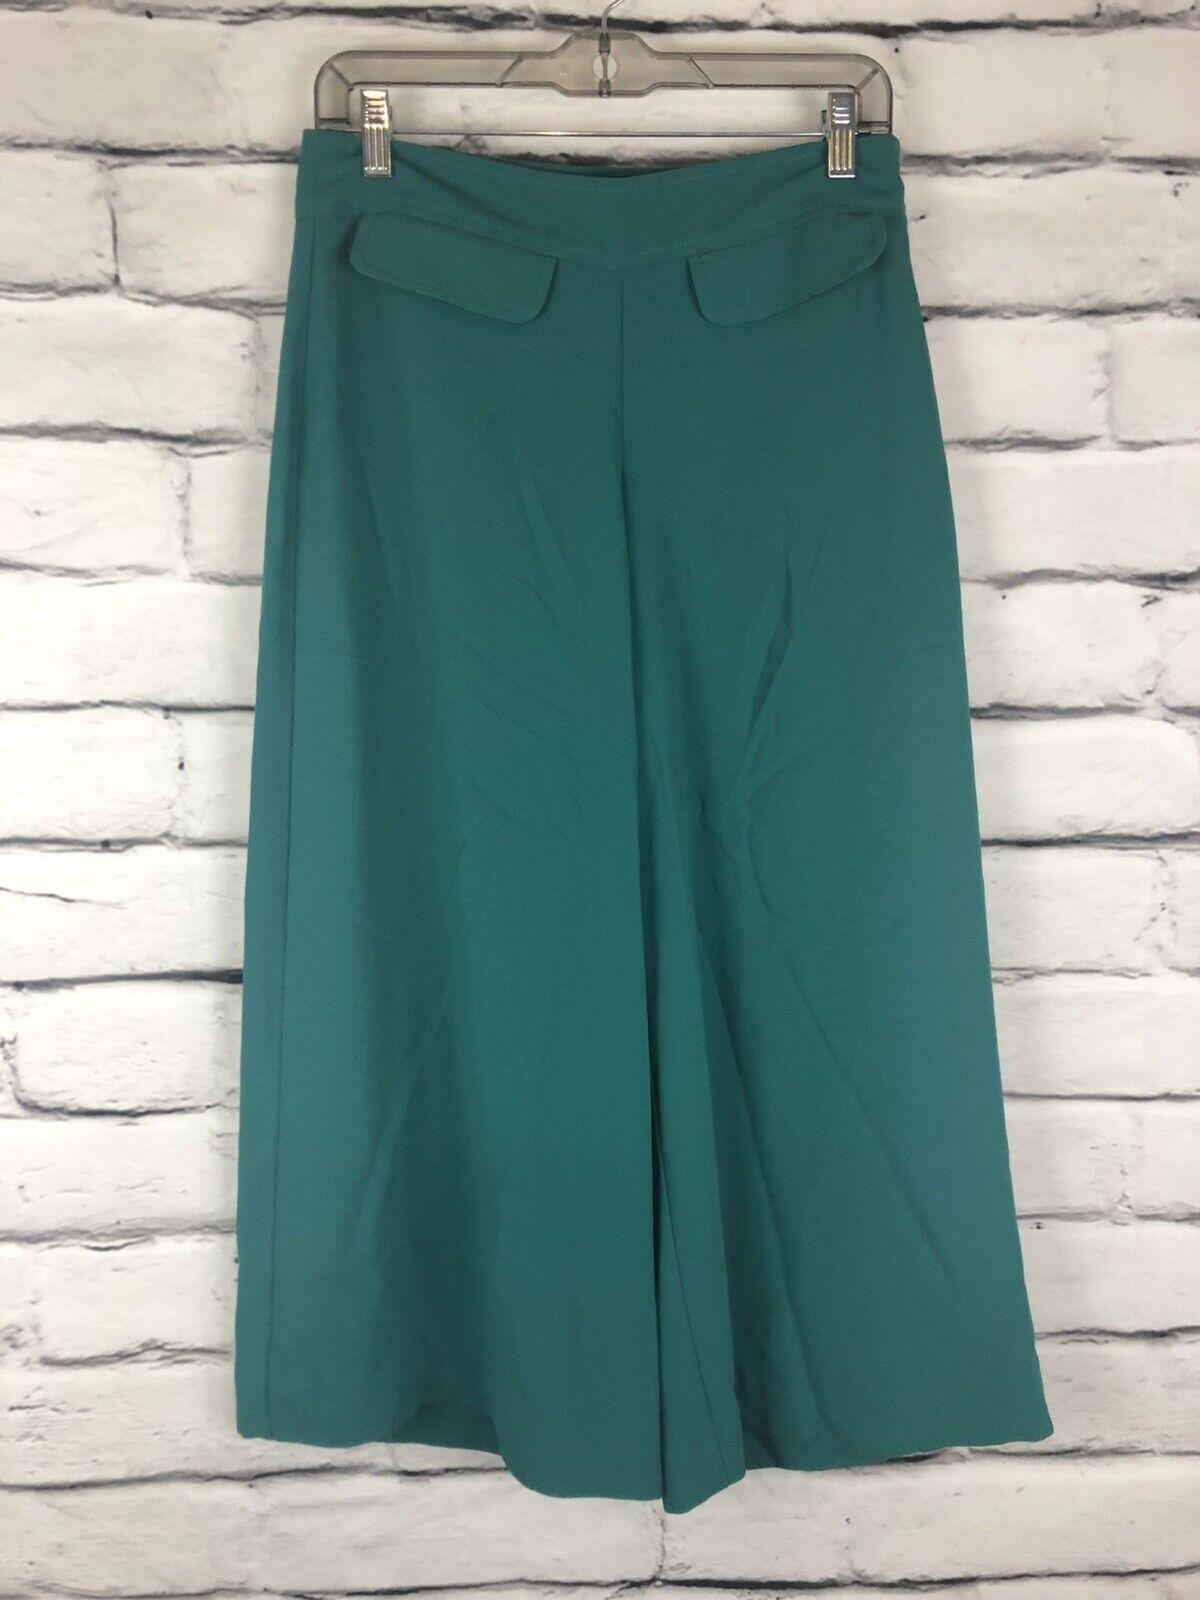 Trina Turk Womens Teal Size 12 Gaucho Pants  - image 1